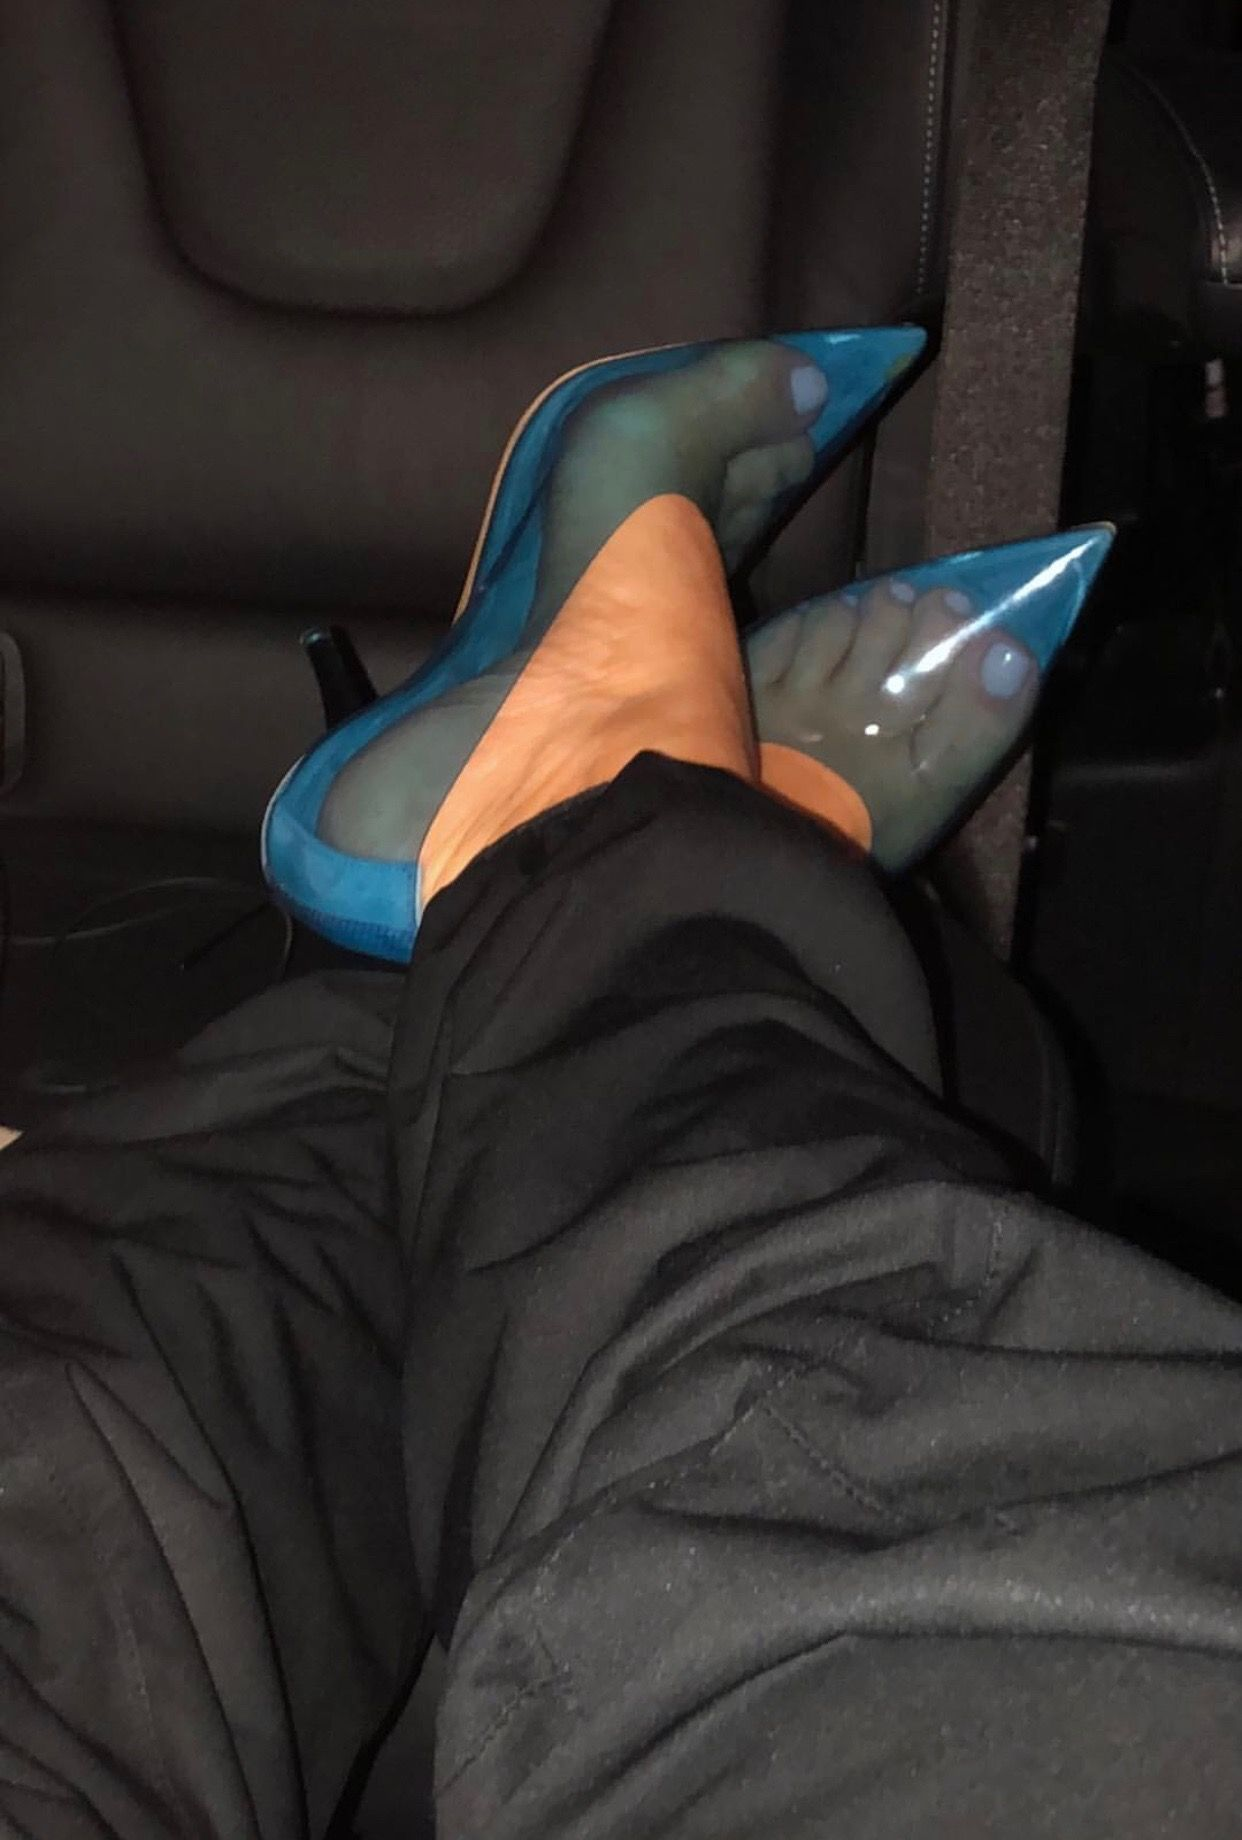 7794249e2 Kim Kardashian in yeezy season 7 blue Perspex heels 💋